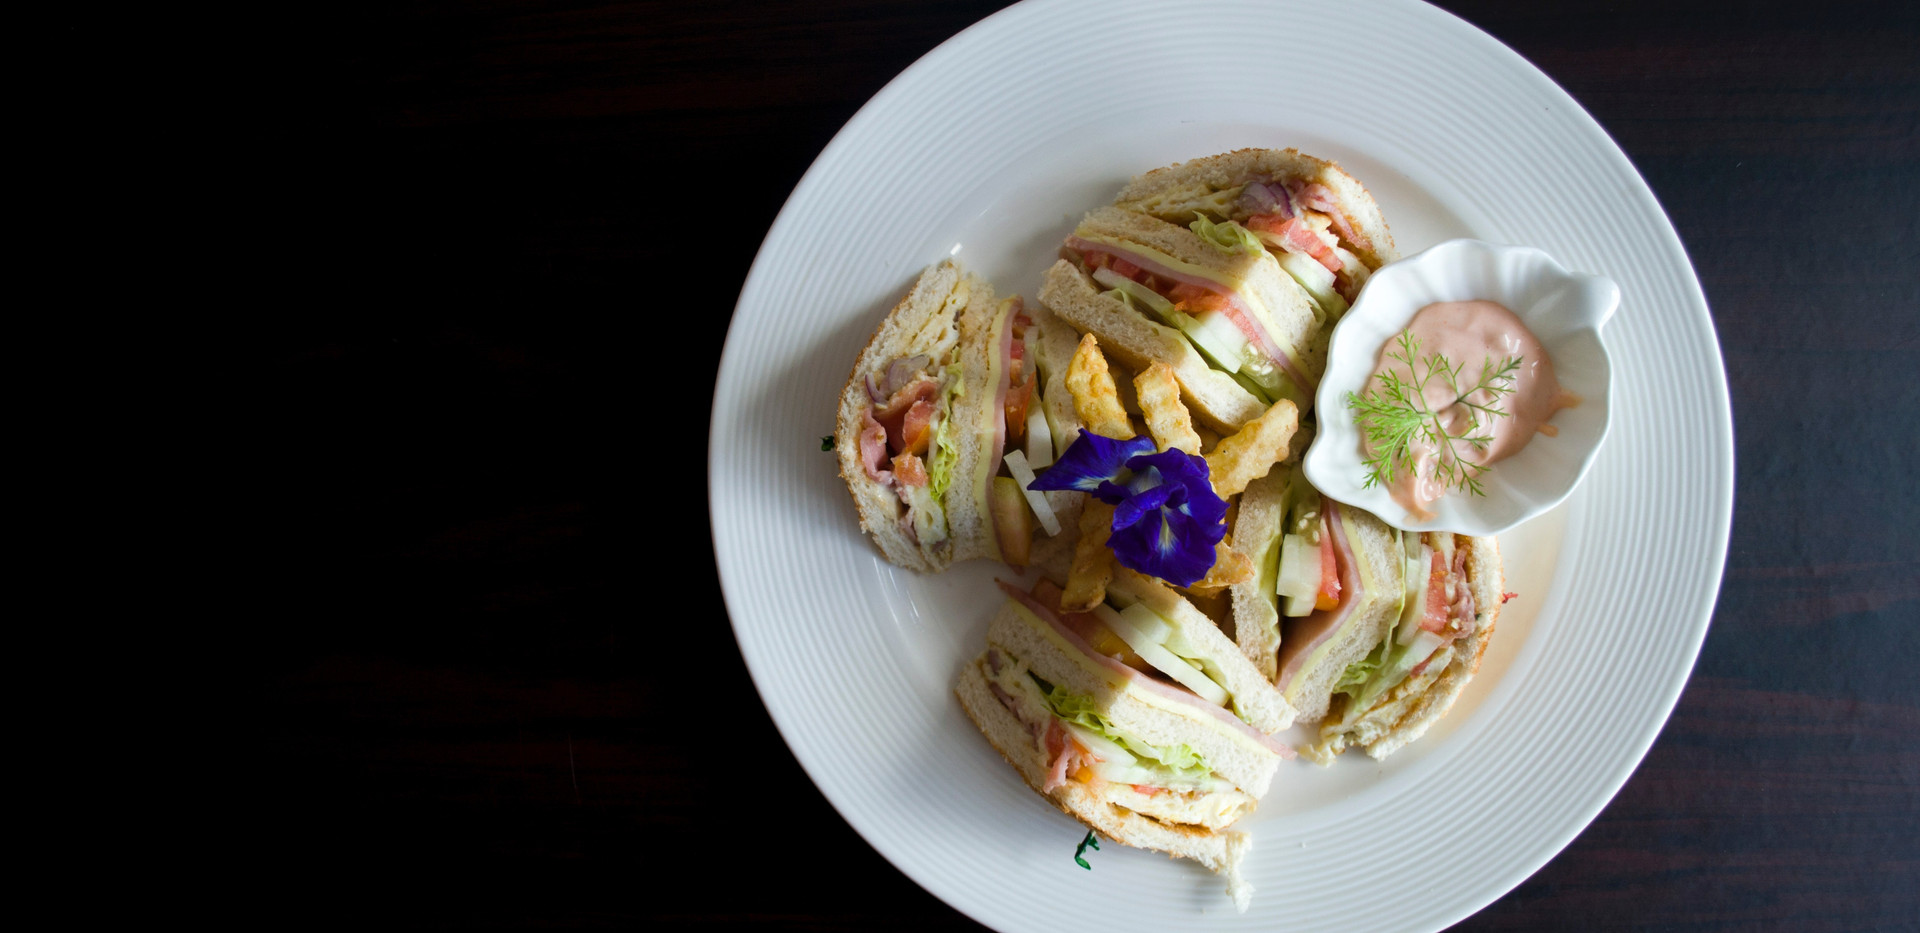 bread-clubhouse-sandwich-delicious-95992